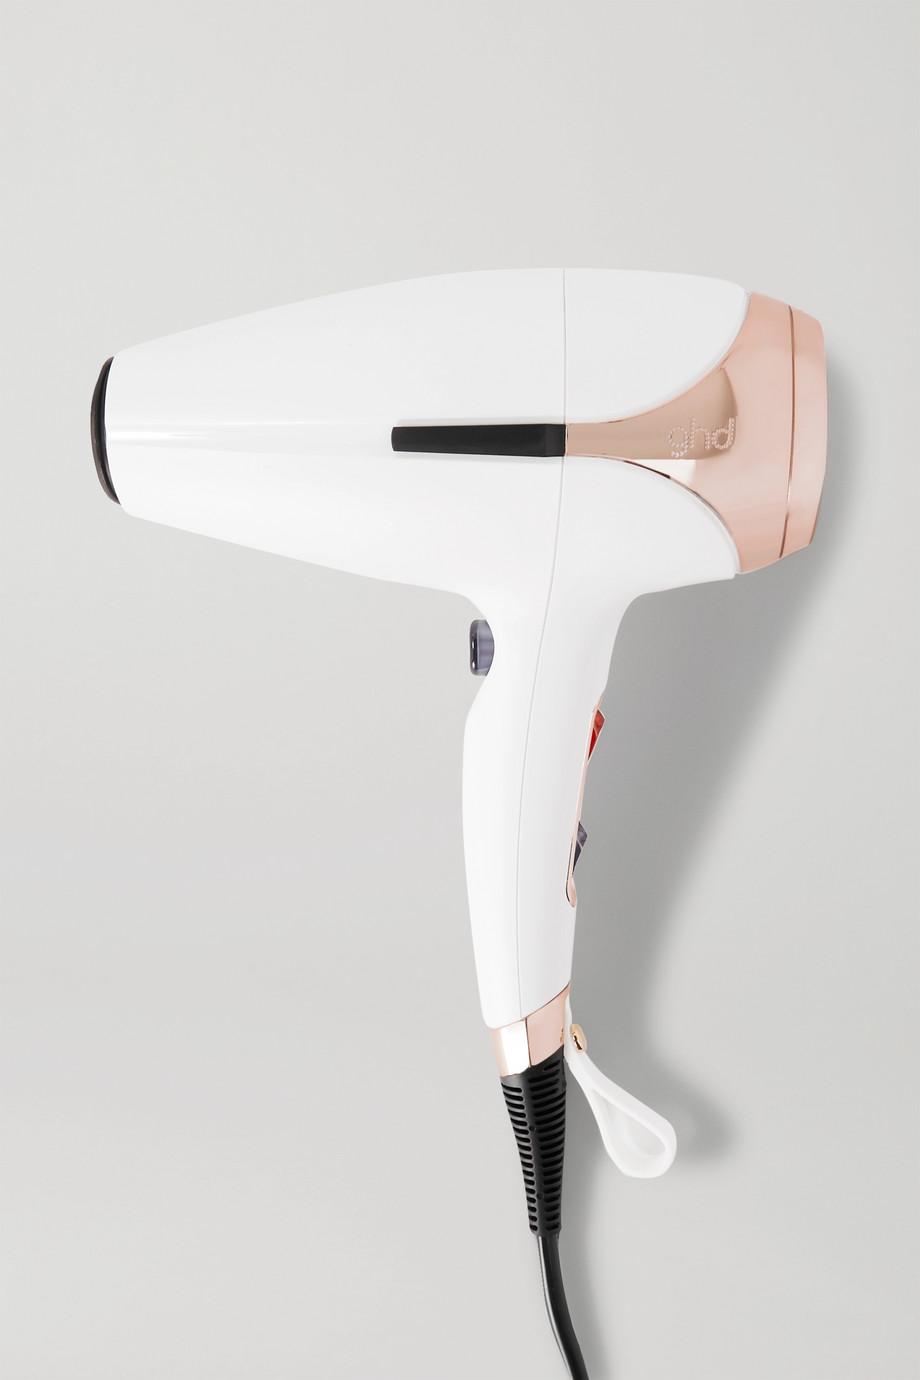 ghd Helios Hairdryer - UK 3-pin plug